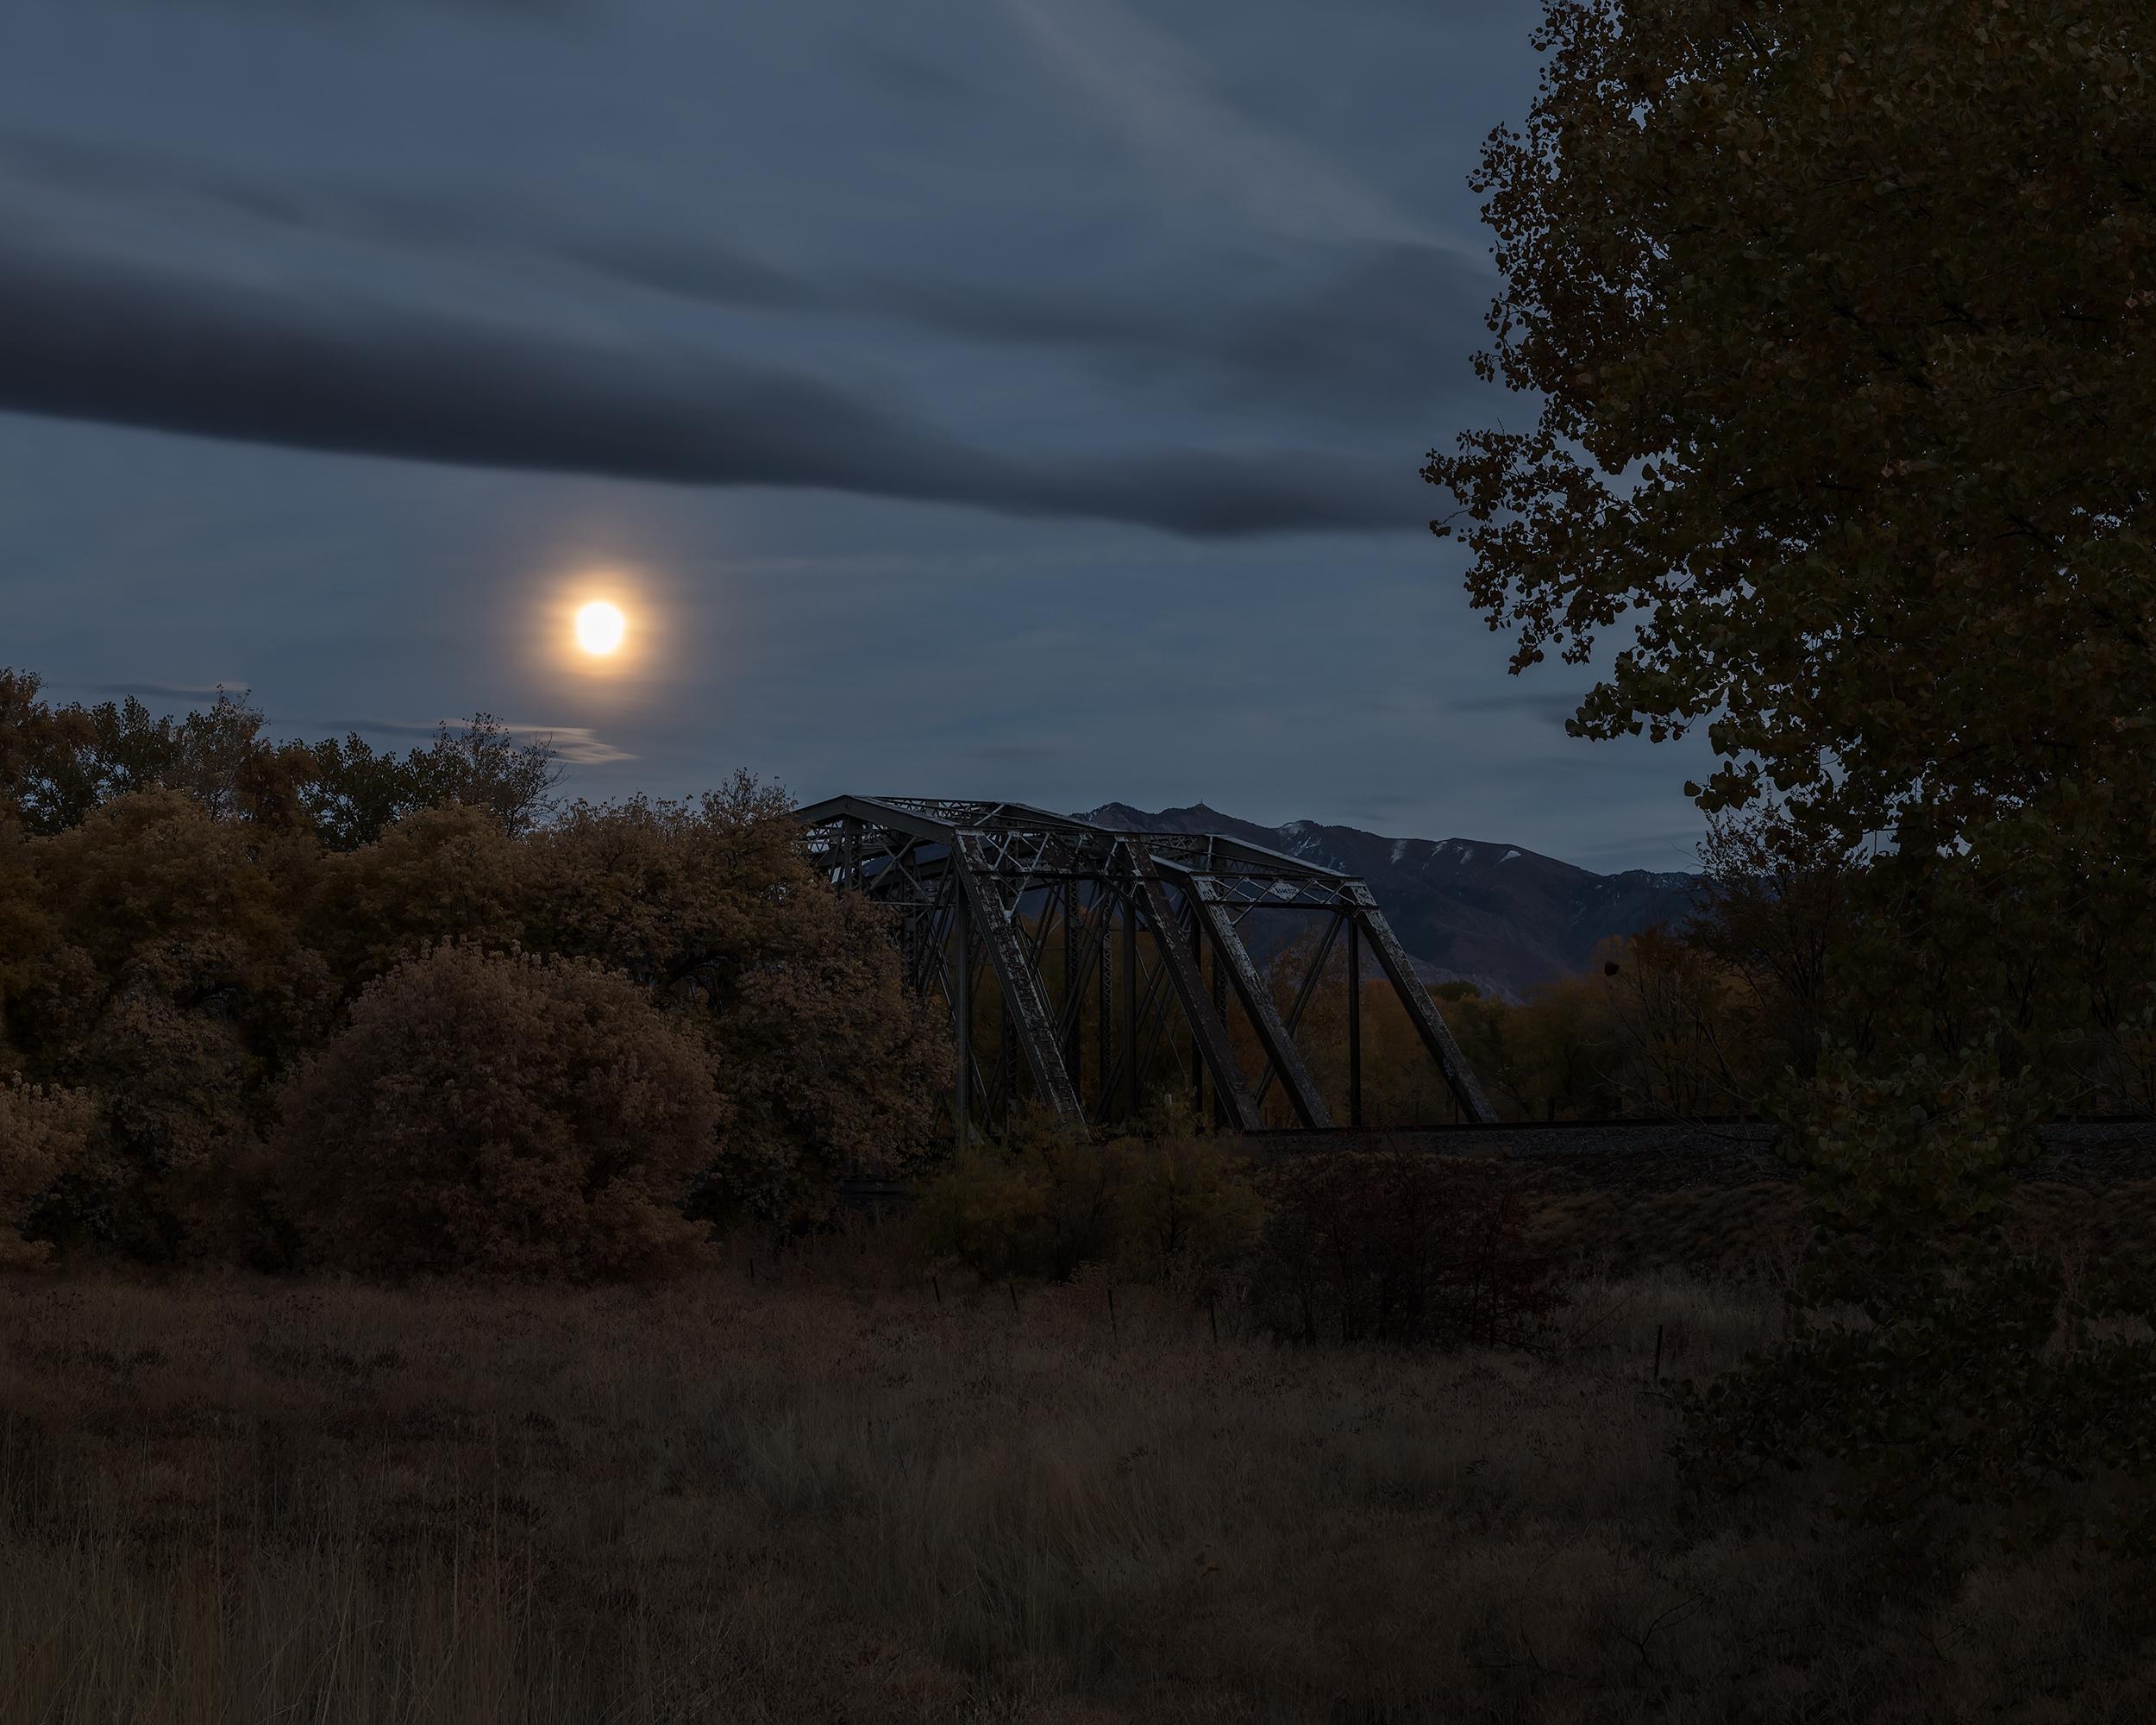 Railroad Trestle Bridge, Montana